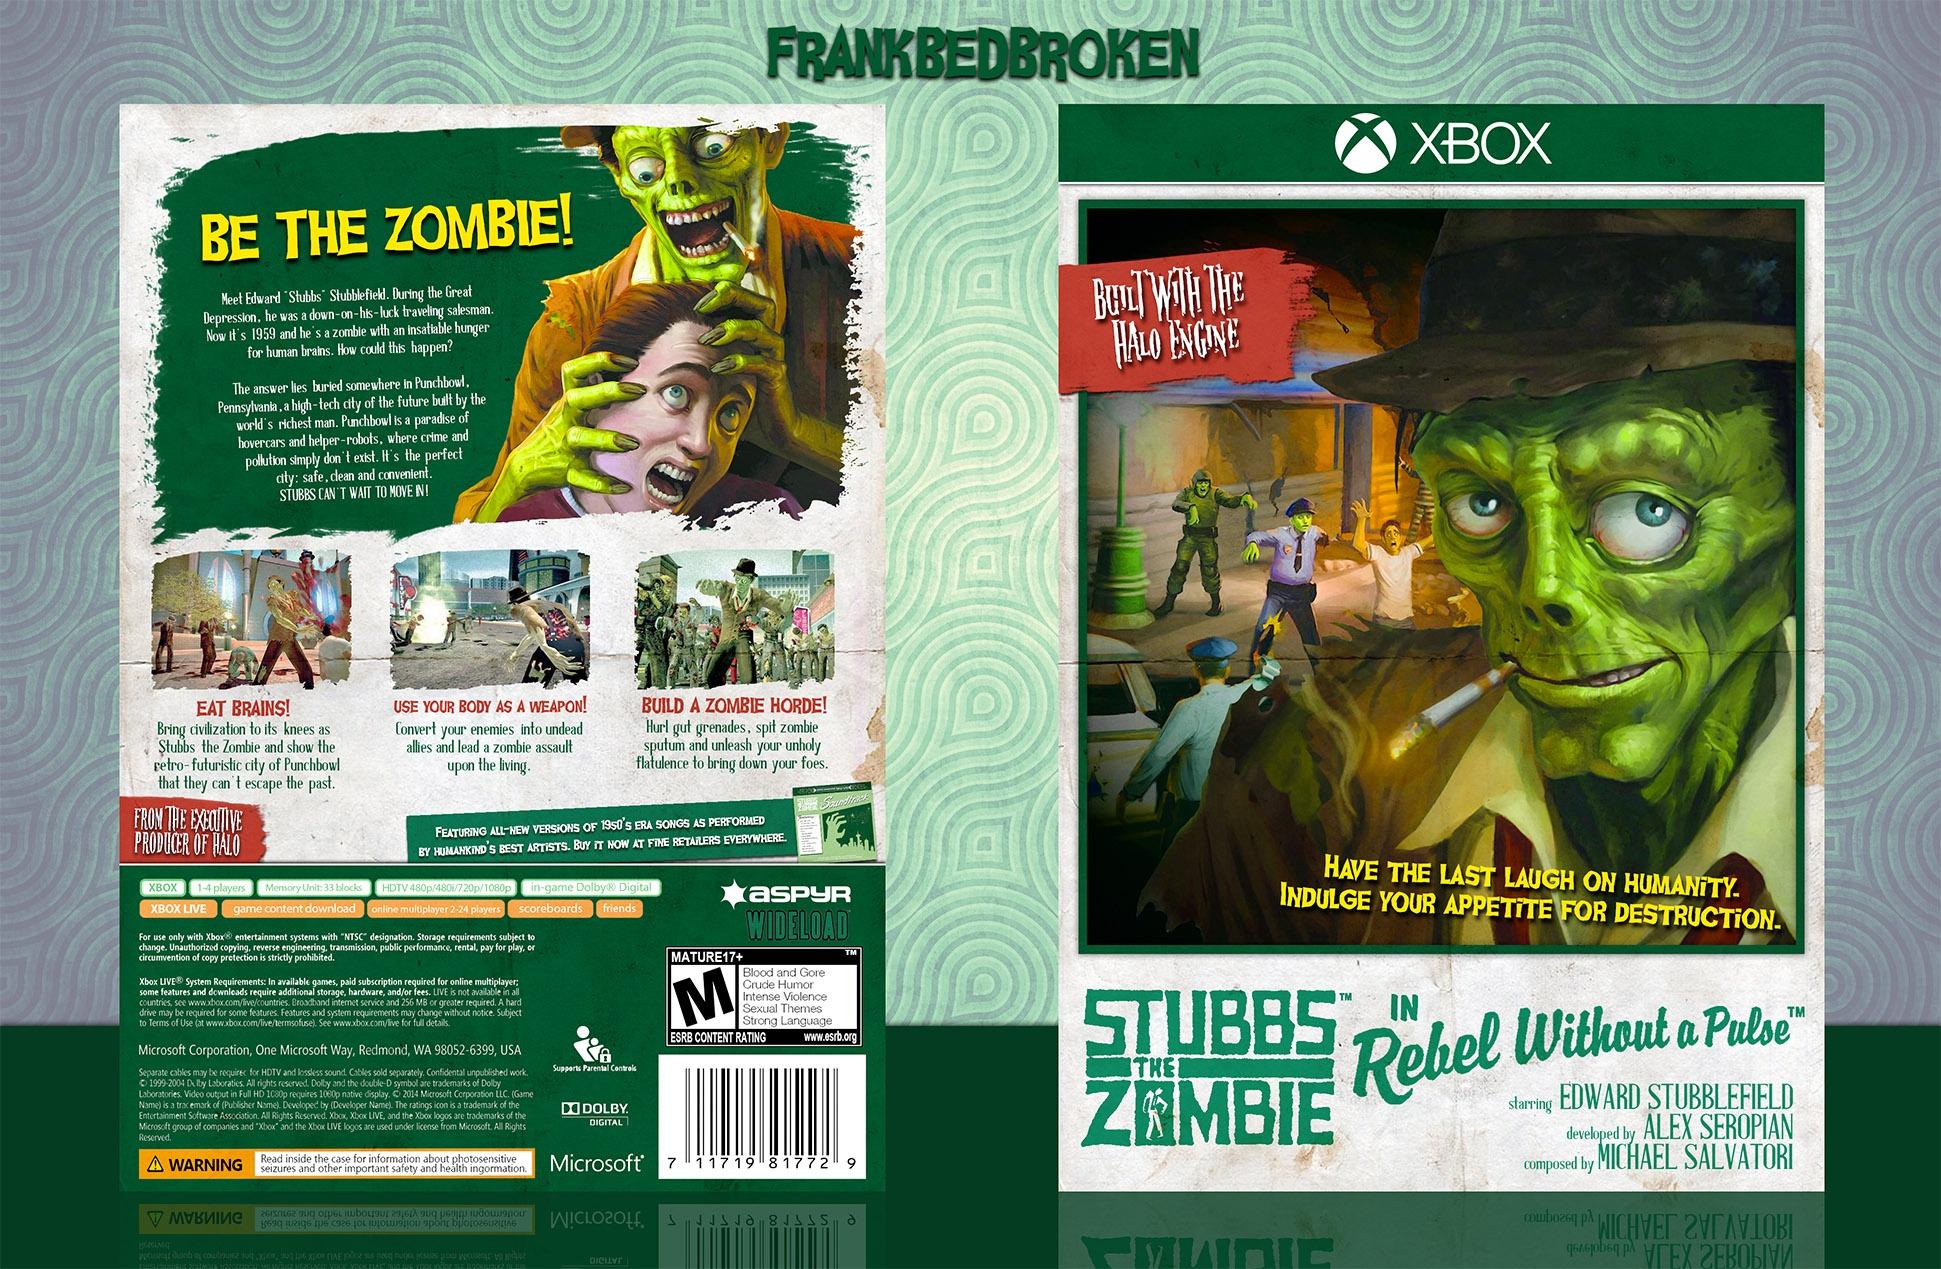 how to fix stubbs the zombie